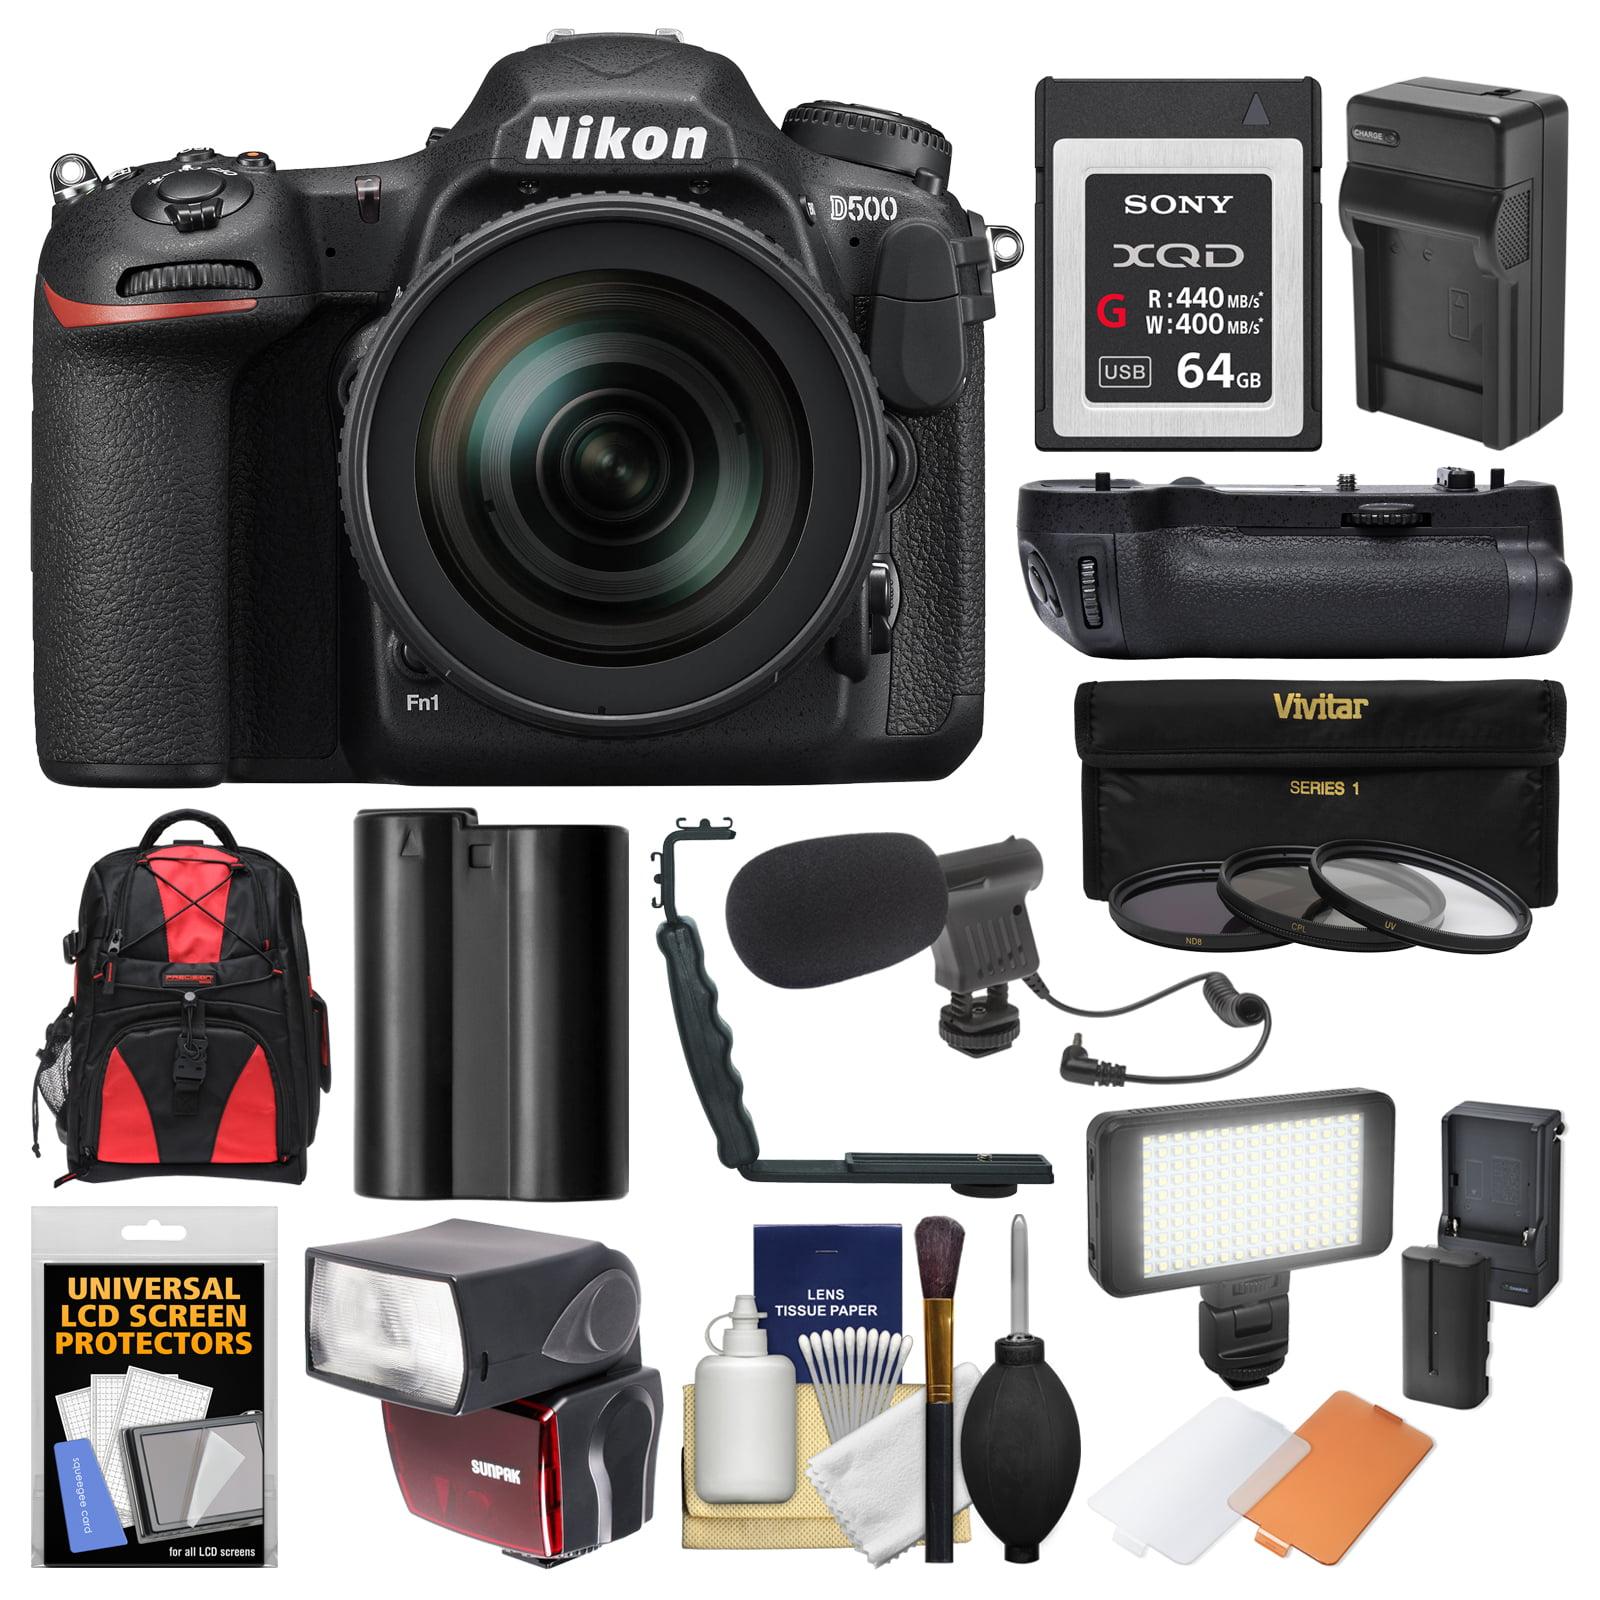 Nikon D500 Wi-Fi 4K Digital SLR Camera & 16-80mm VR Lens with 64GB XQD Card + Case + Flash + Battery Charger +... by Nikon